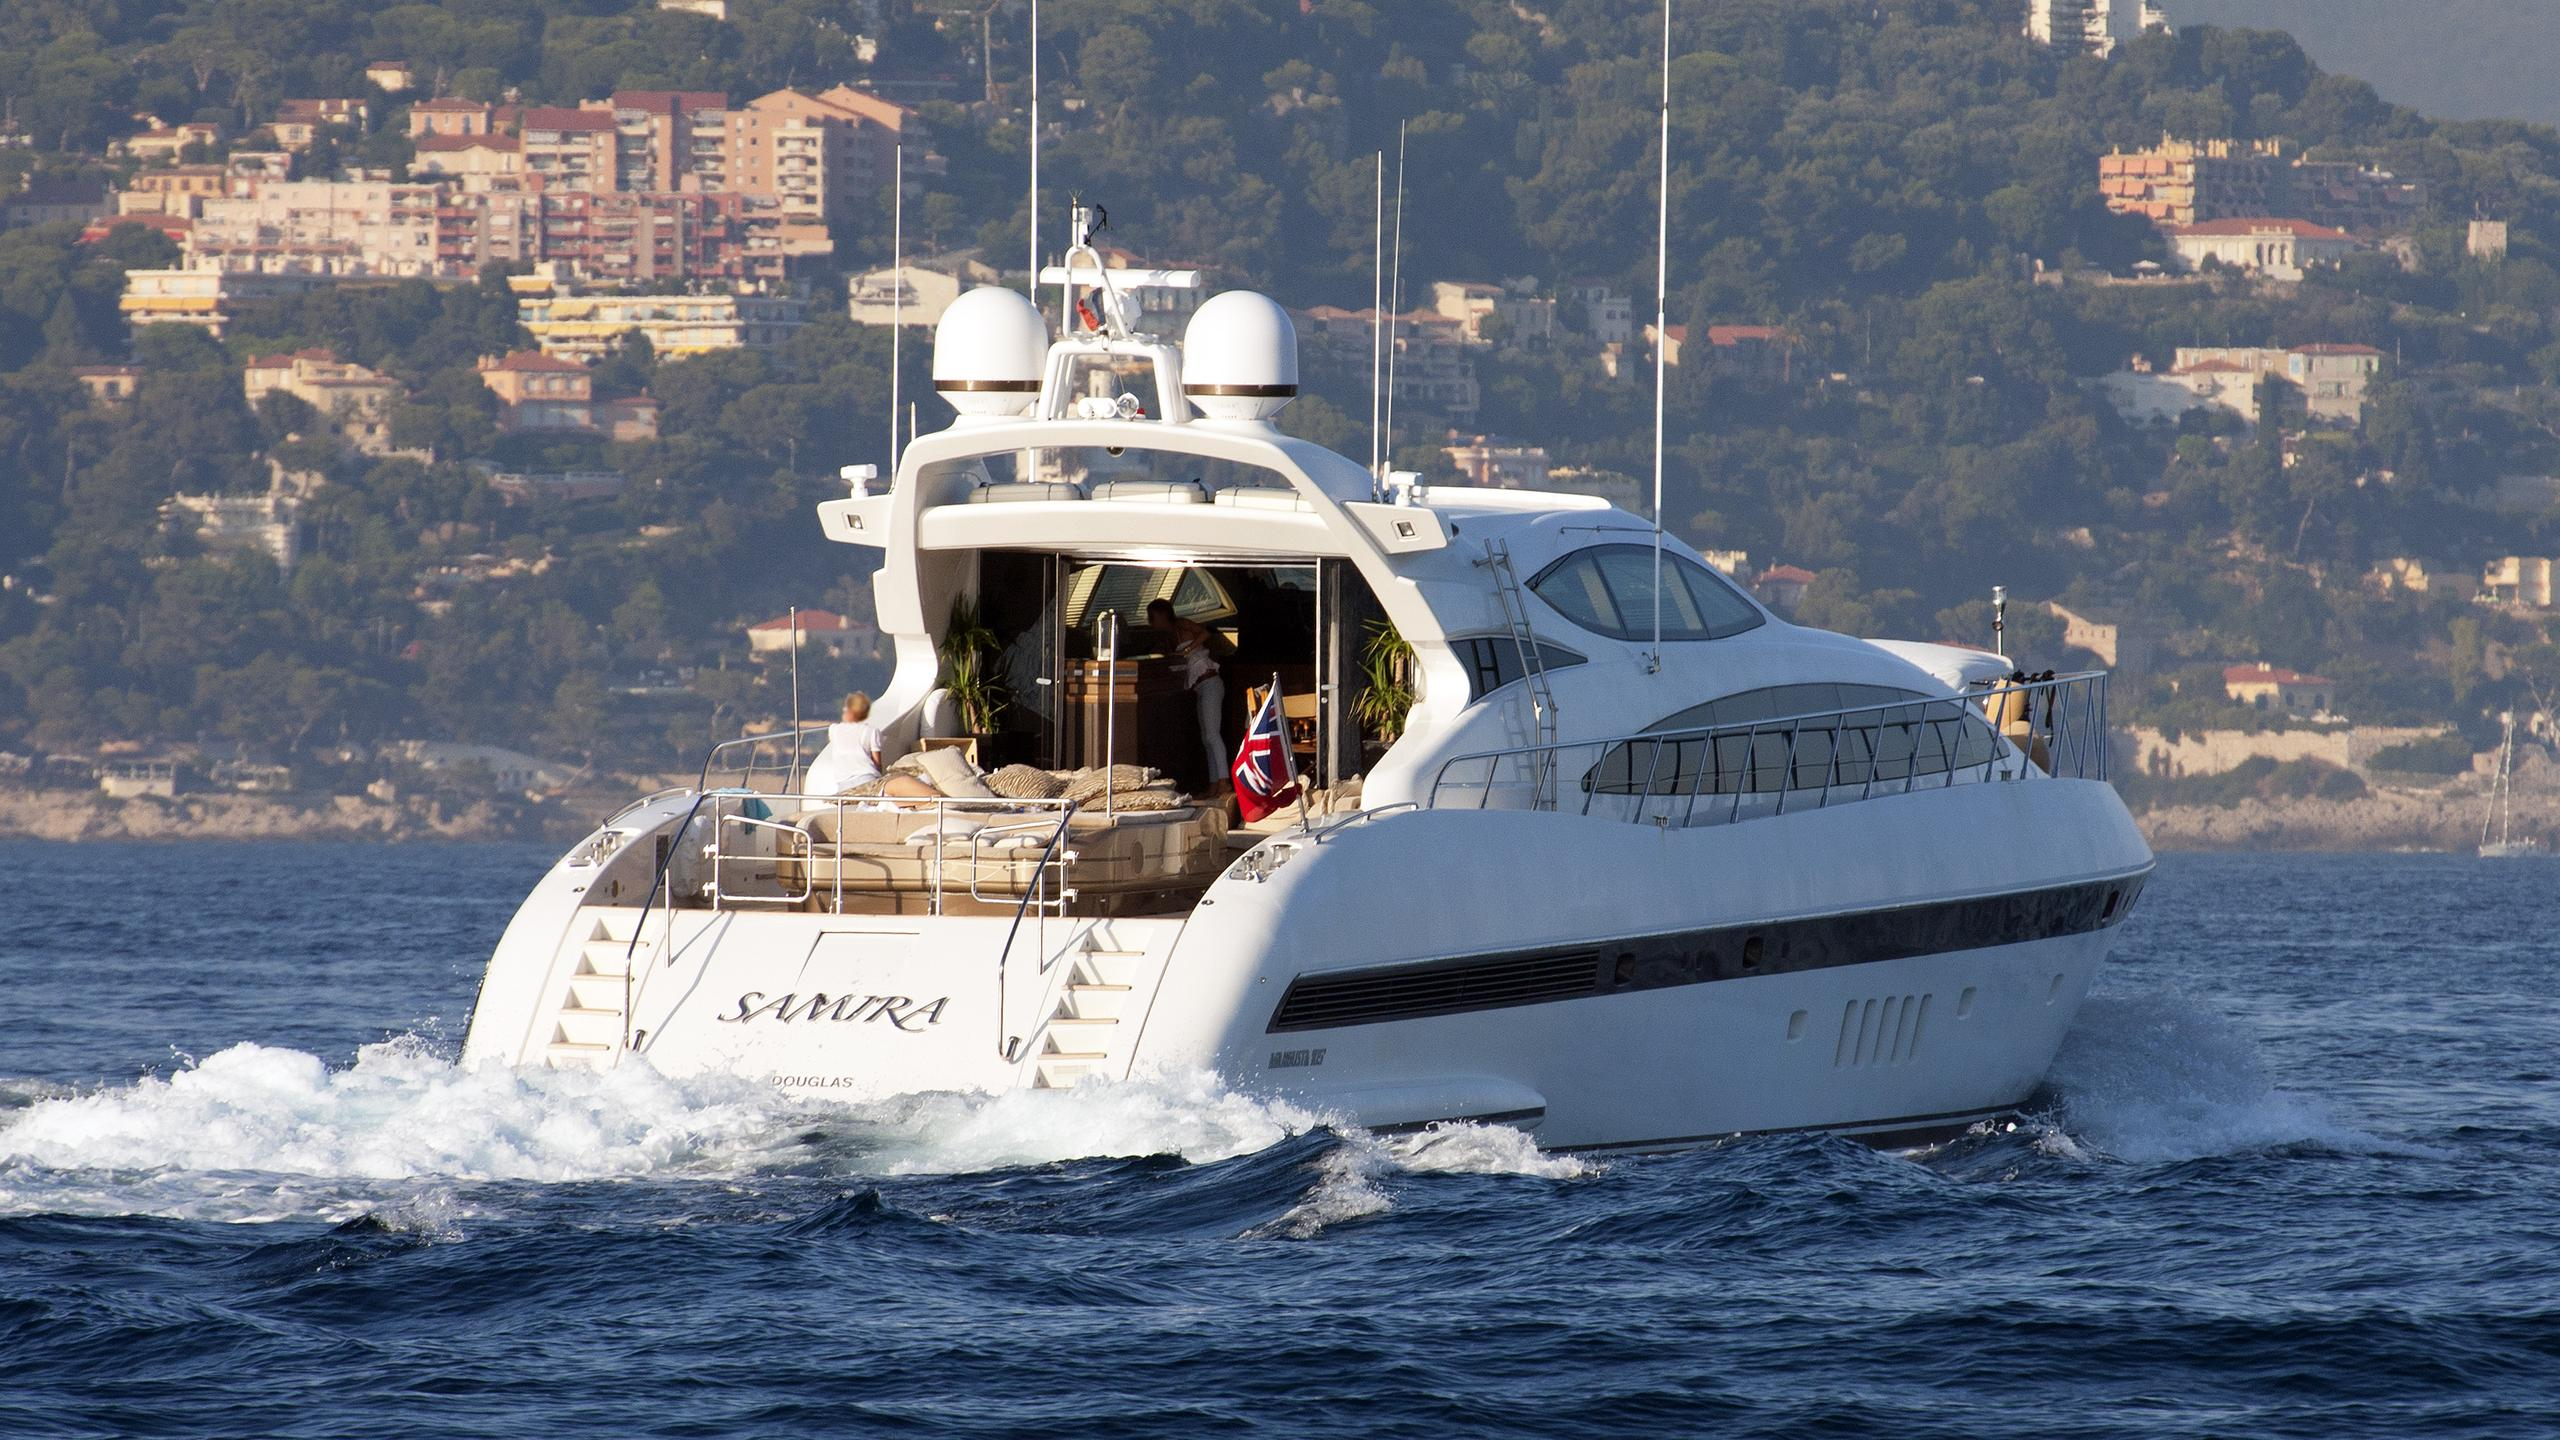 samira-motor-yacht-overmarine-mangusta-105-sport-2006-31m-stern